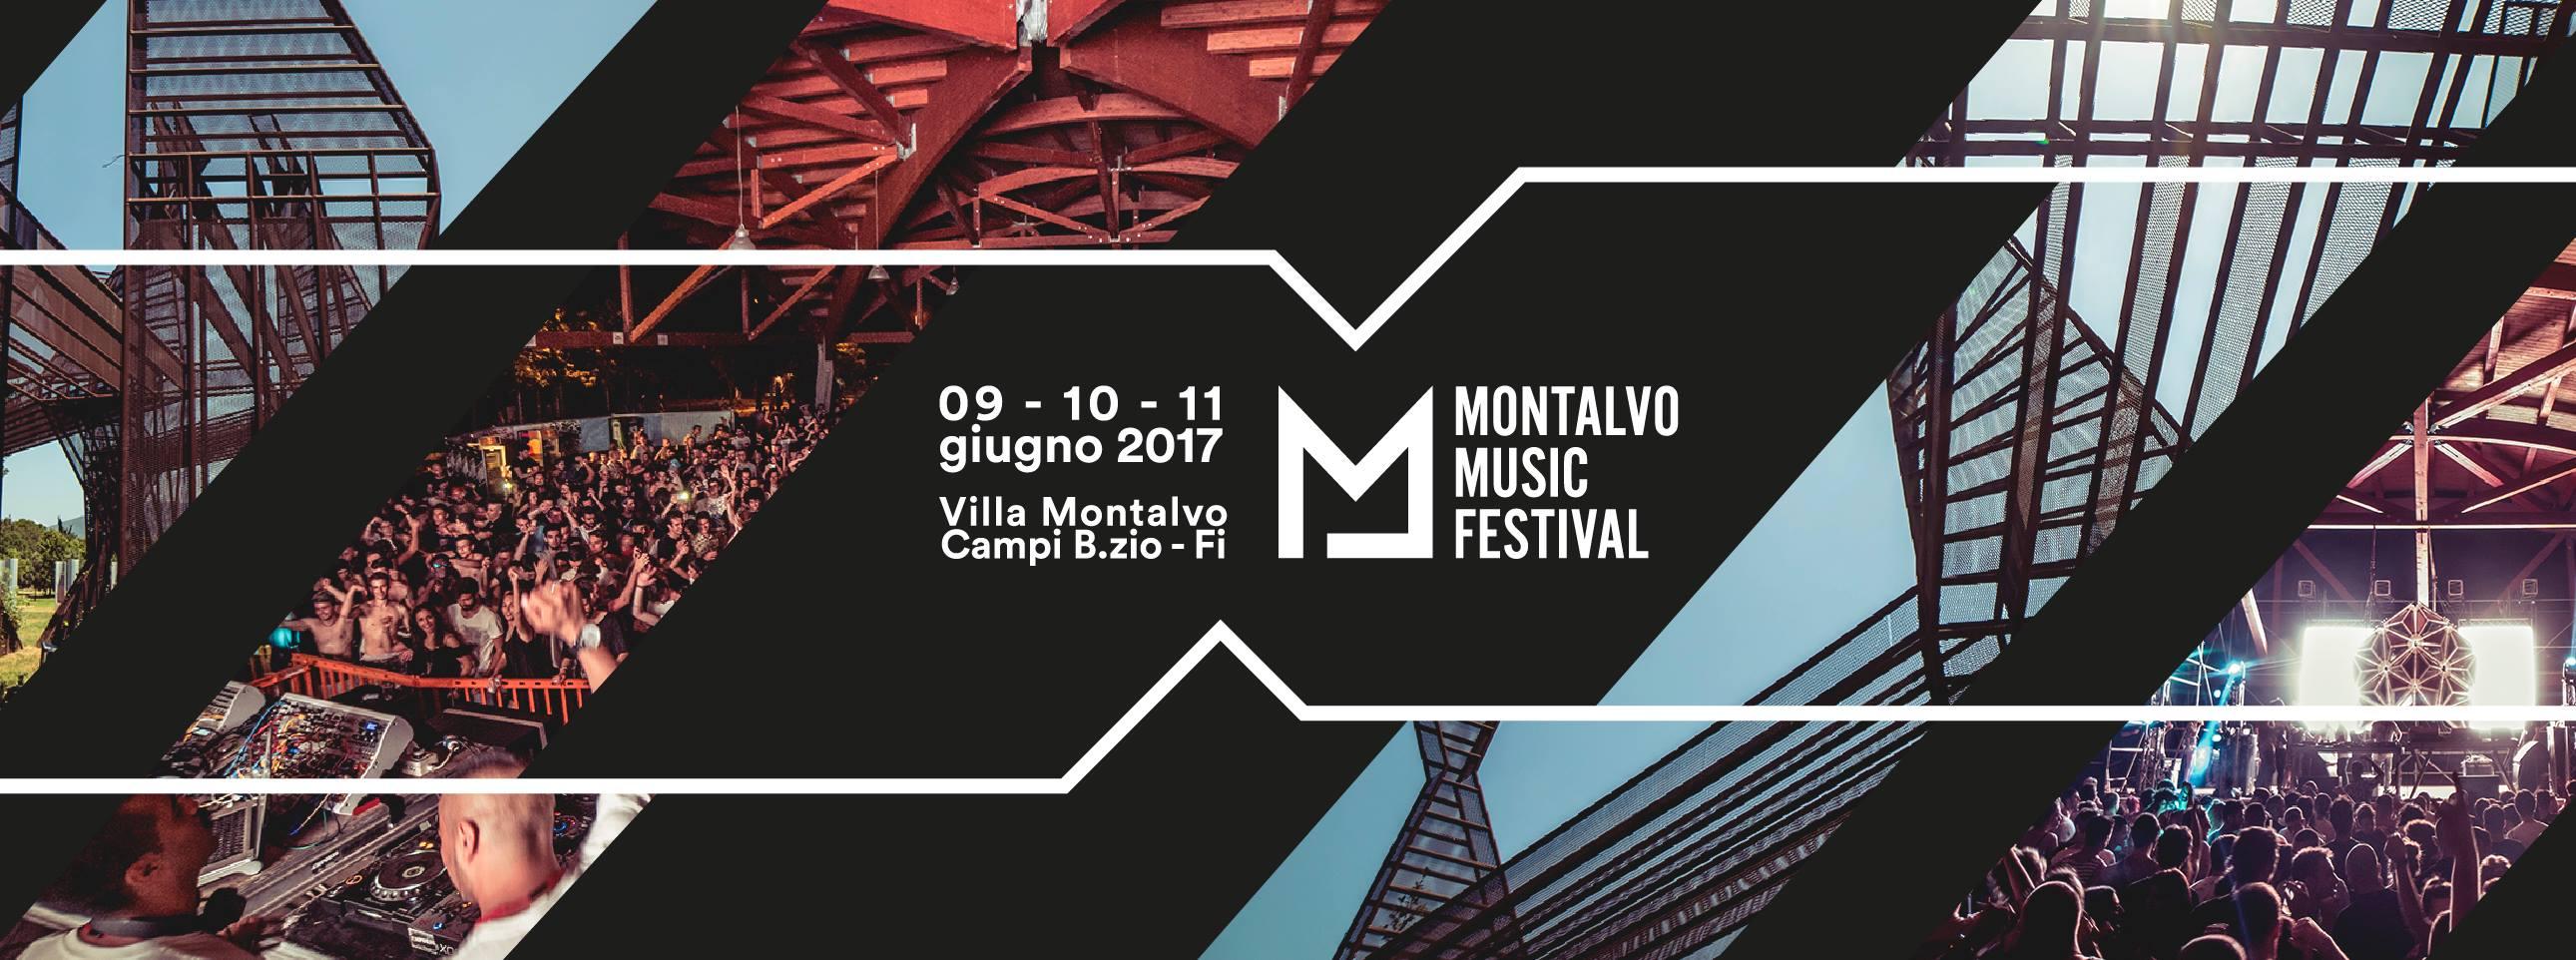 Montalvo Music Festival 2017 Firenze